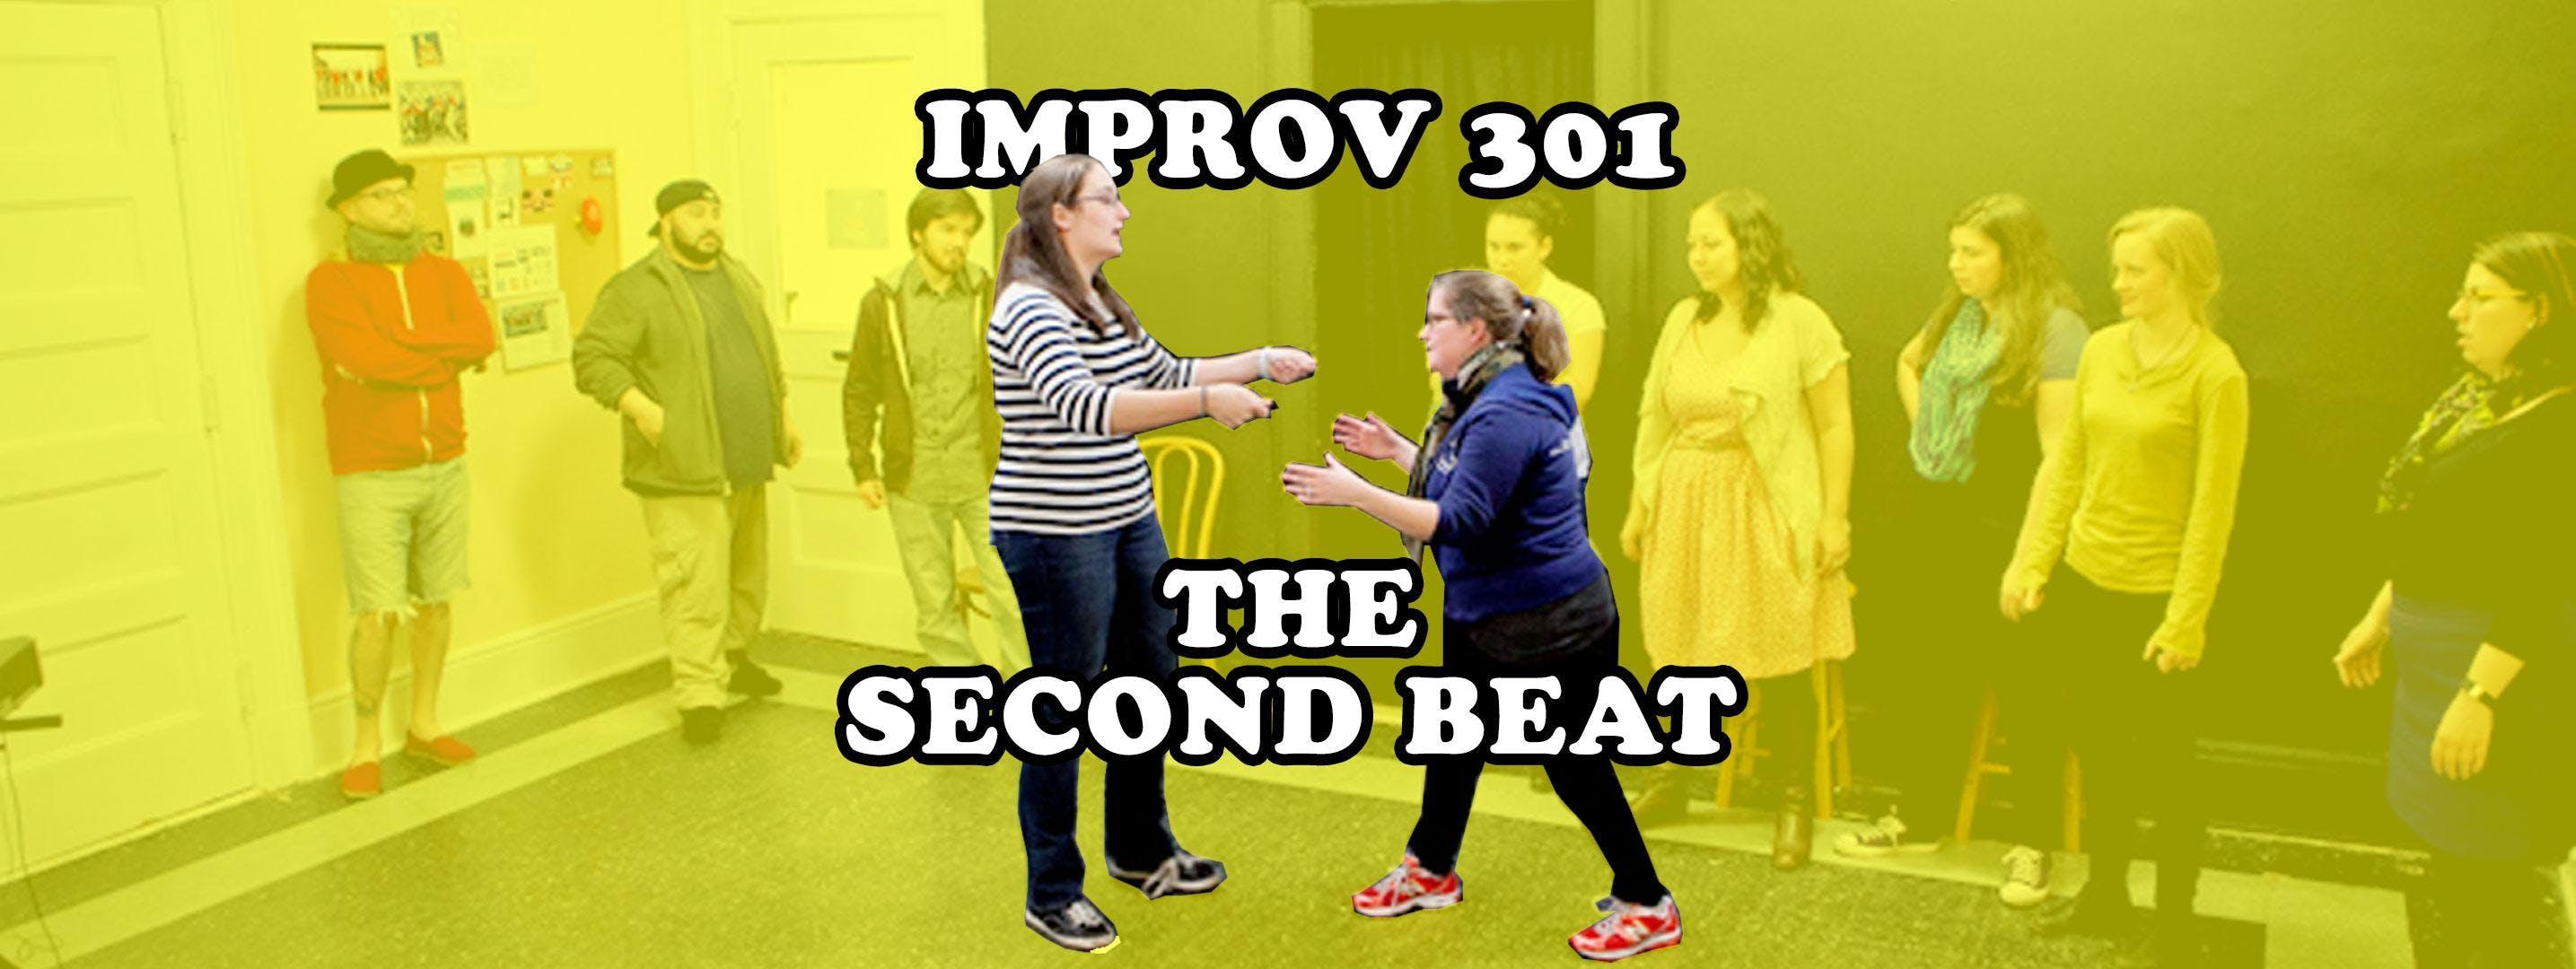 Improv 301 - The Second Beat